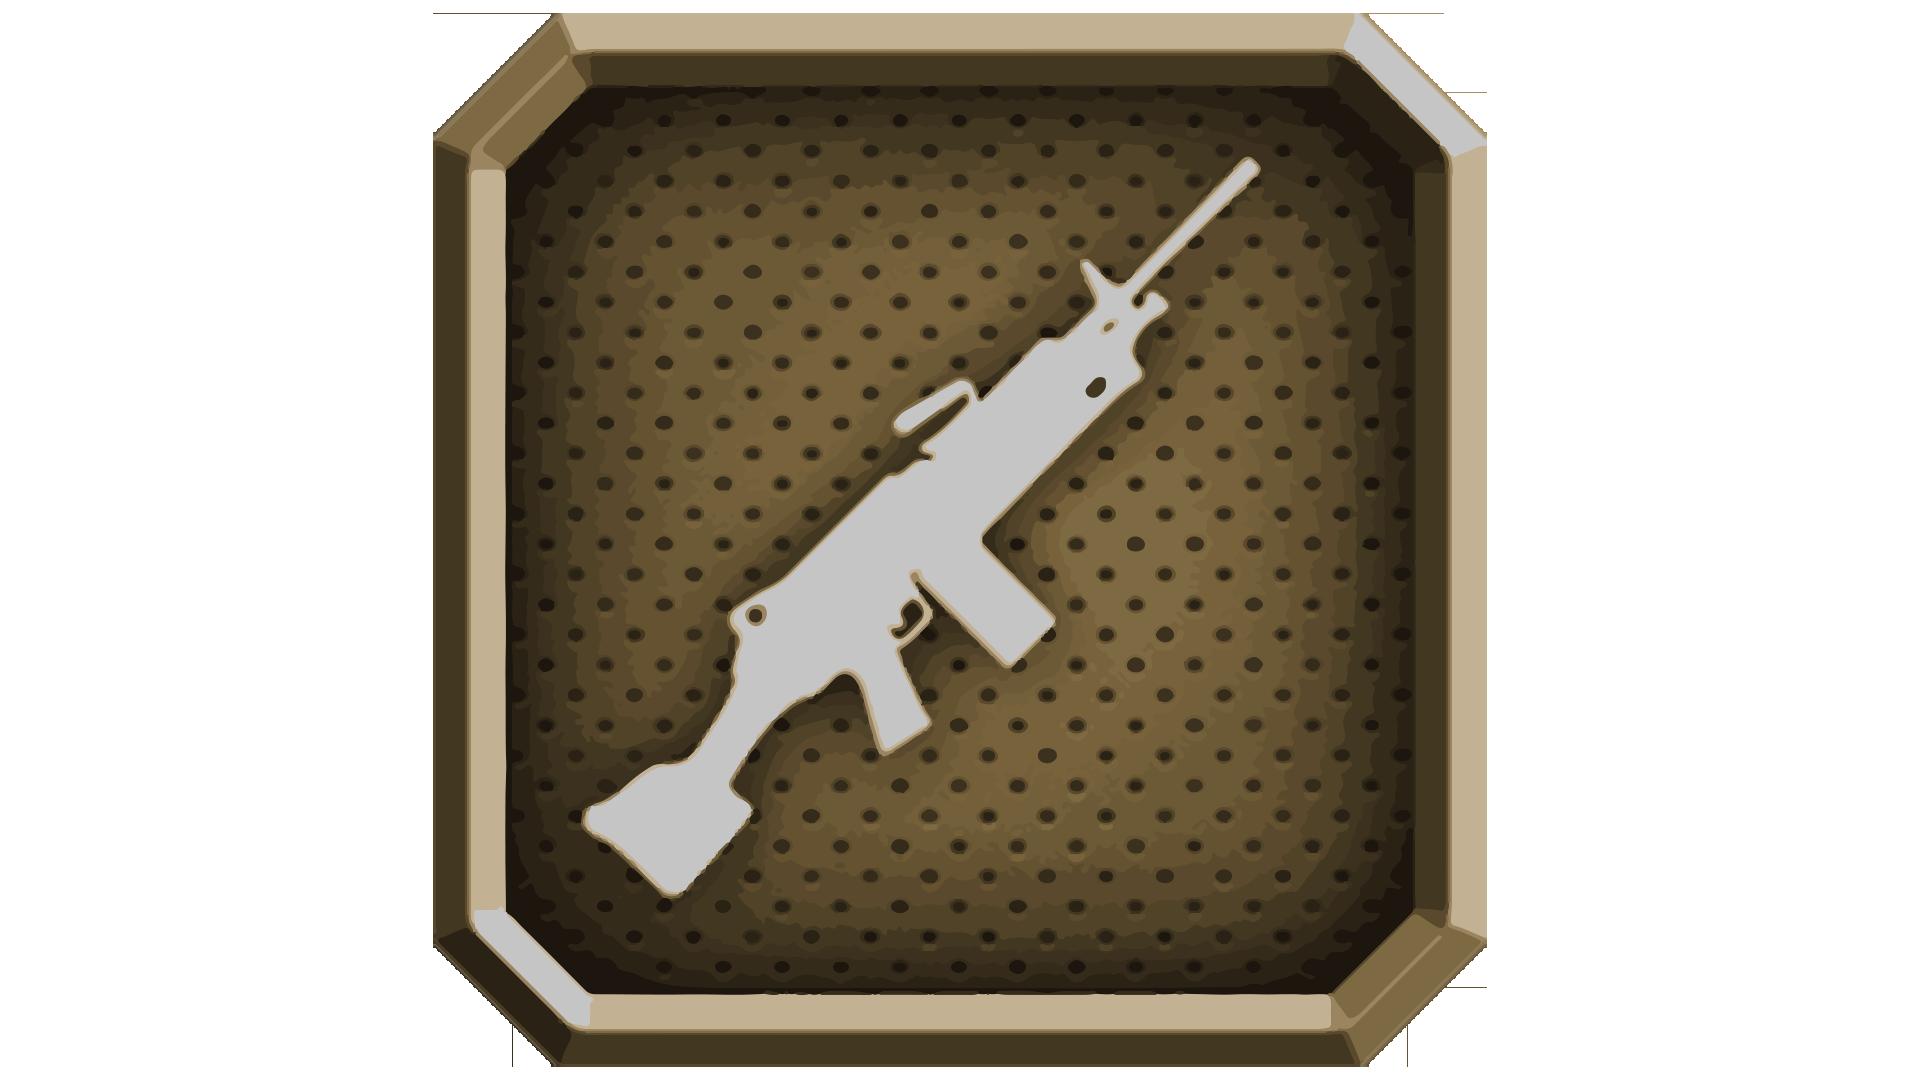 M249 Slayer achievement for Dead Alliance on Xbox One